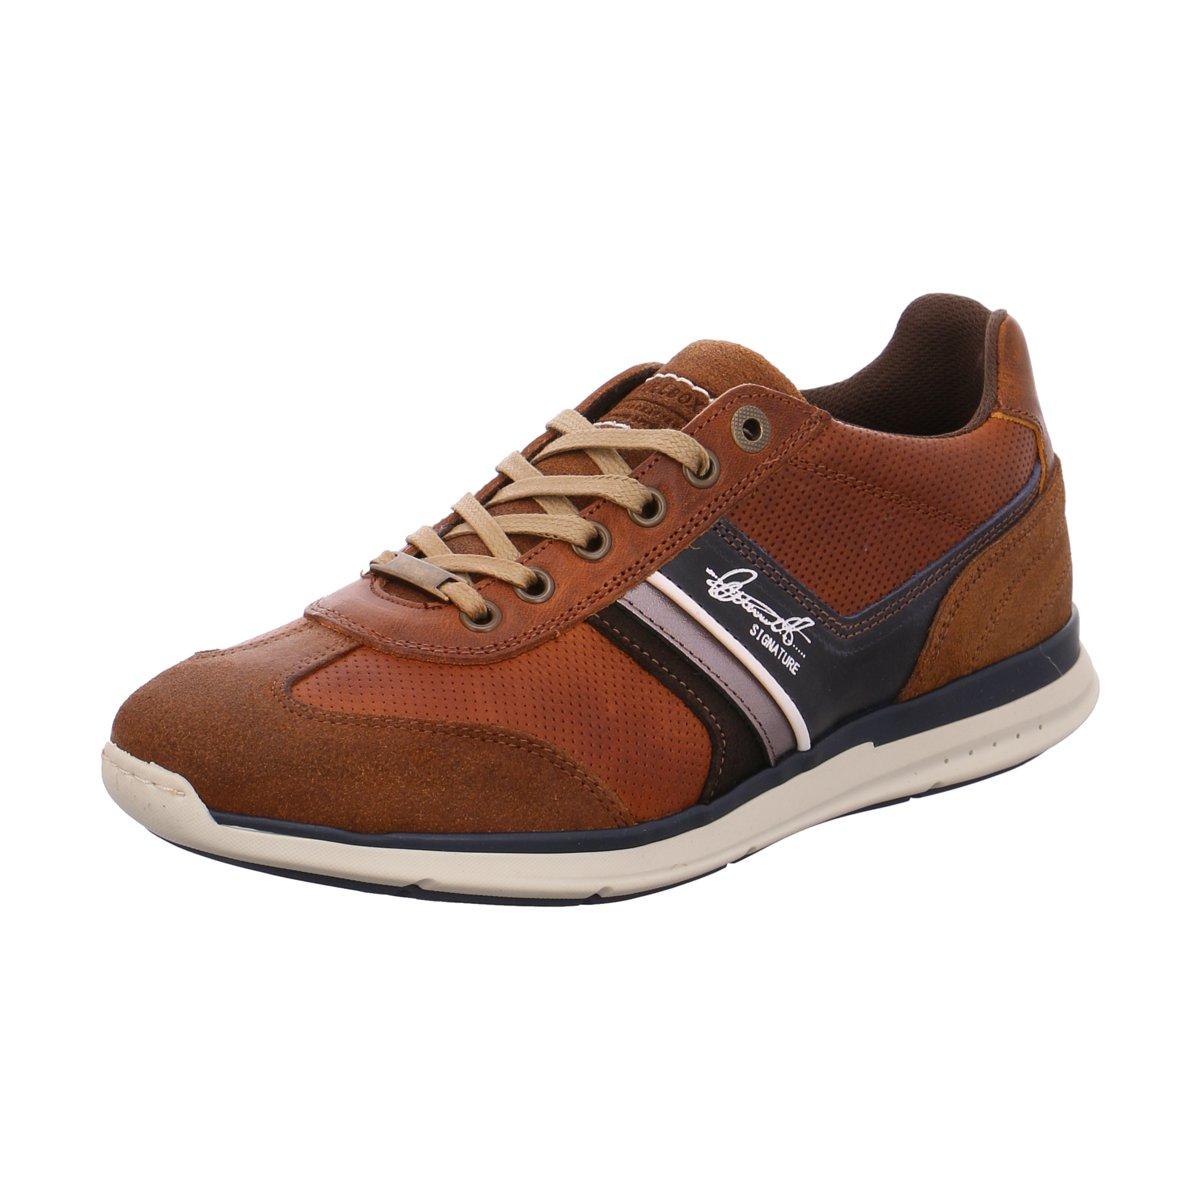 NEU Bullboxer Herren Sneaker Schnürhalbschuh 630K25362ACONBSU00 braun 423432